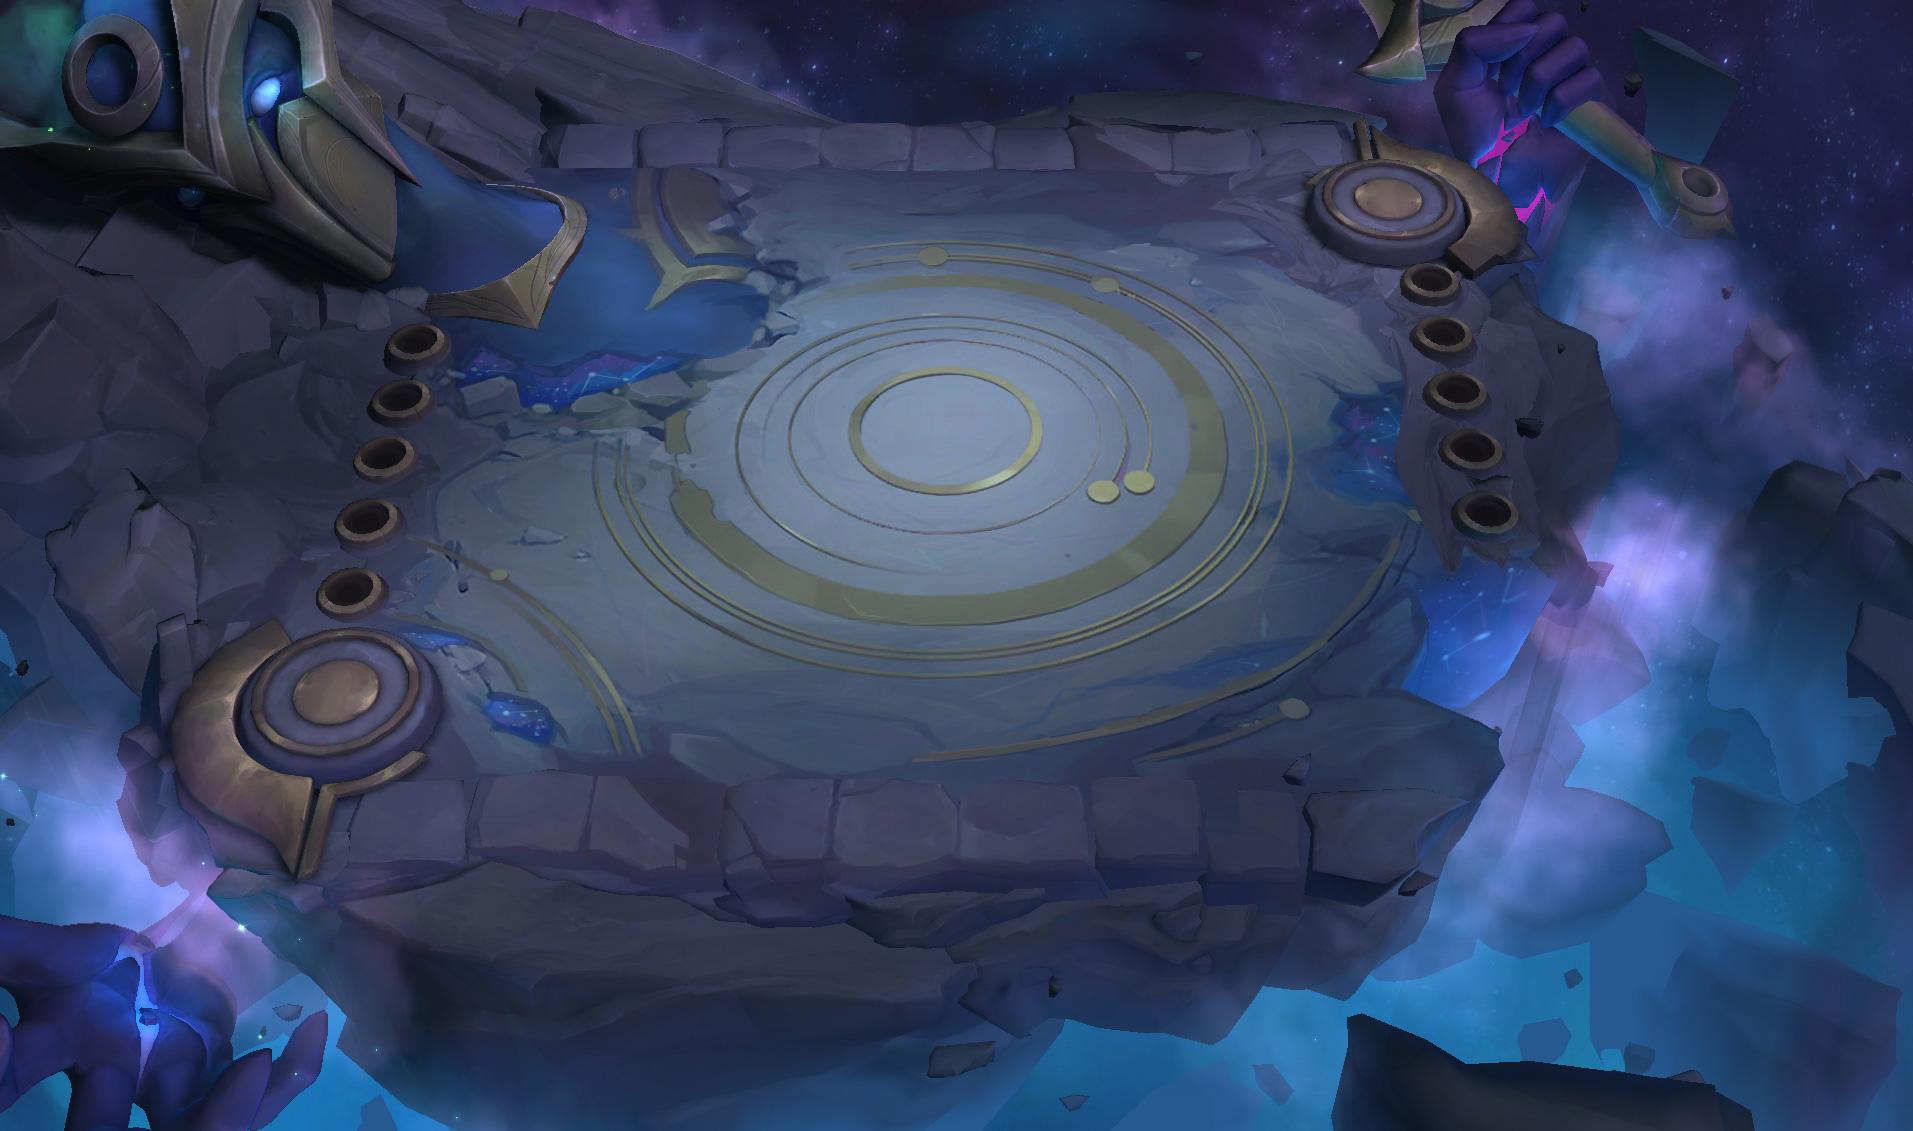 darkstar-celestial-pc-cam.jpg